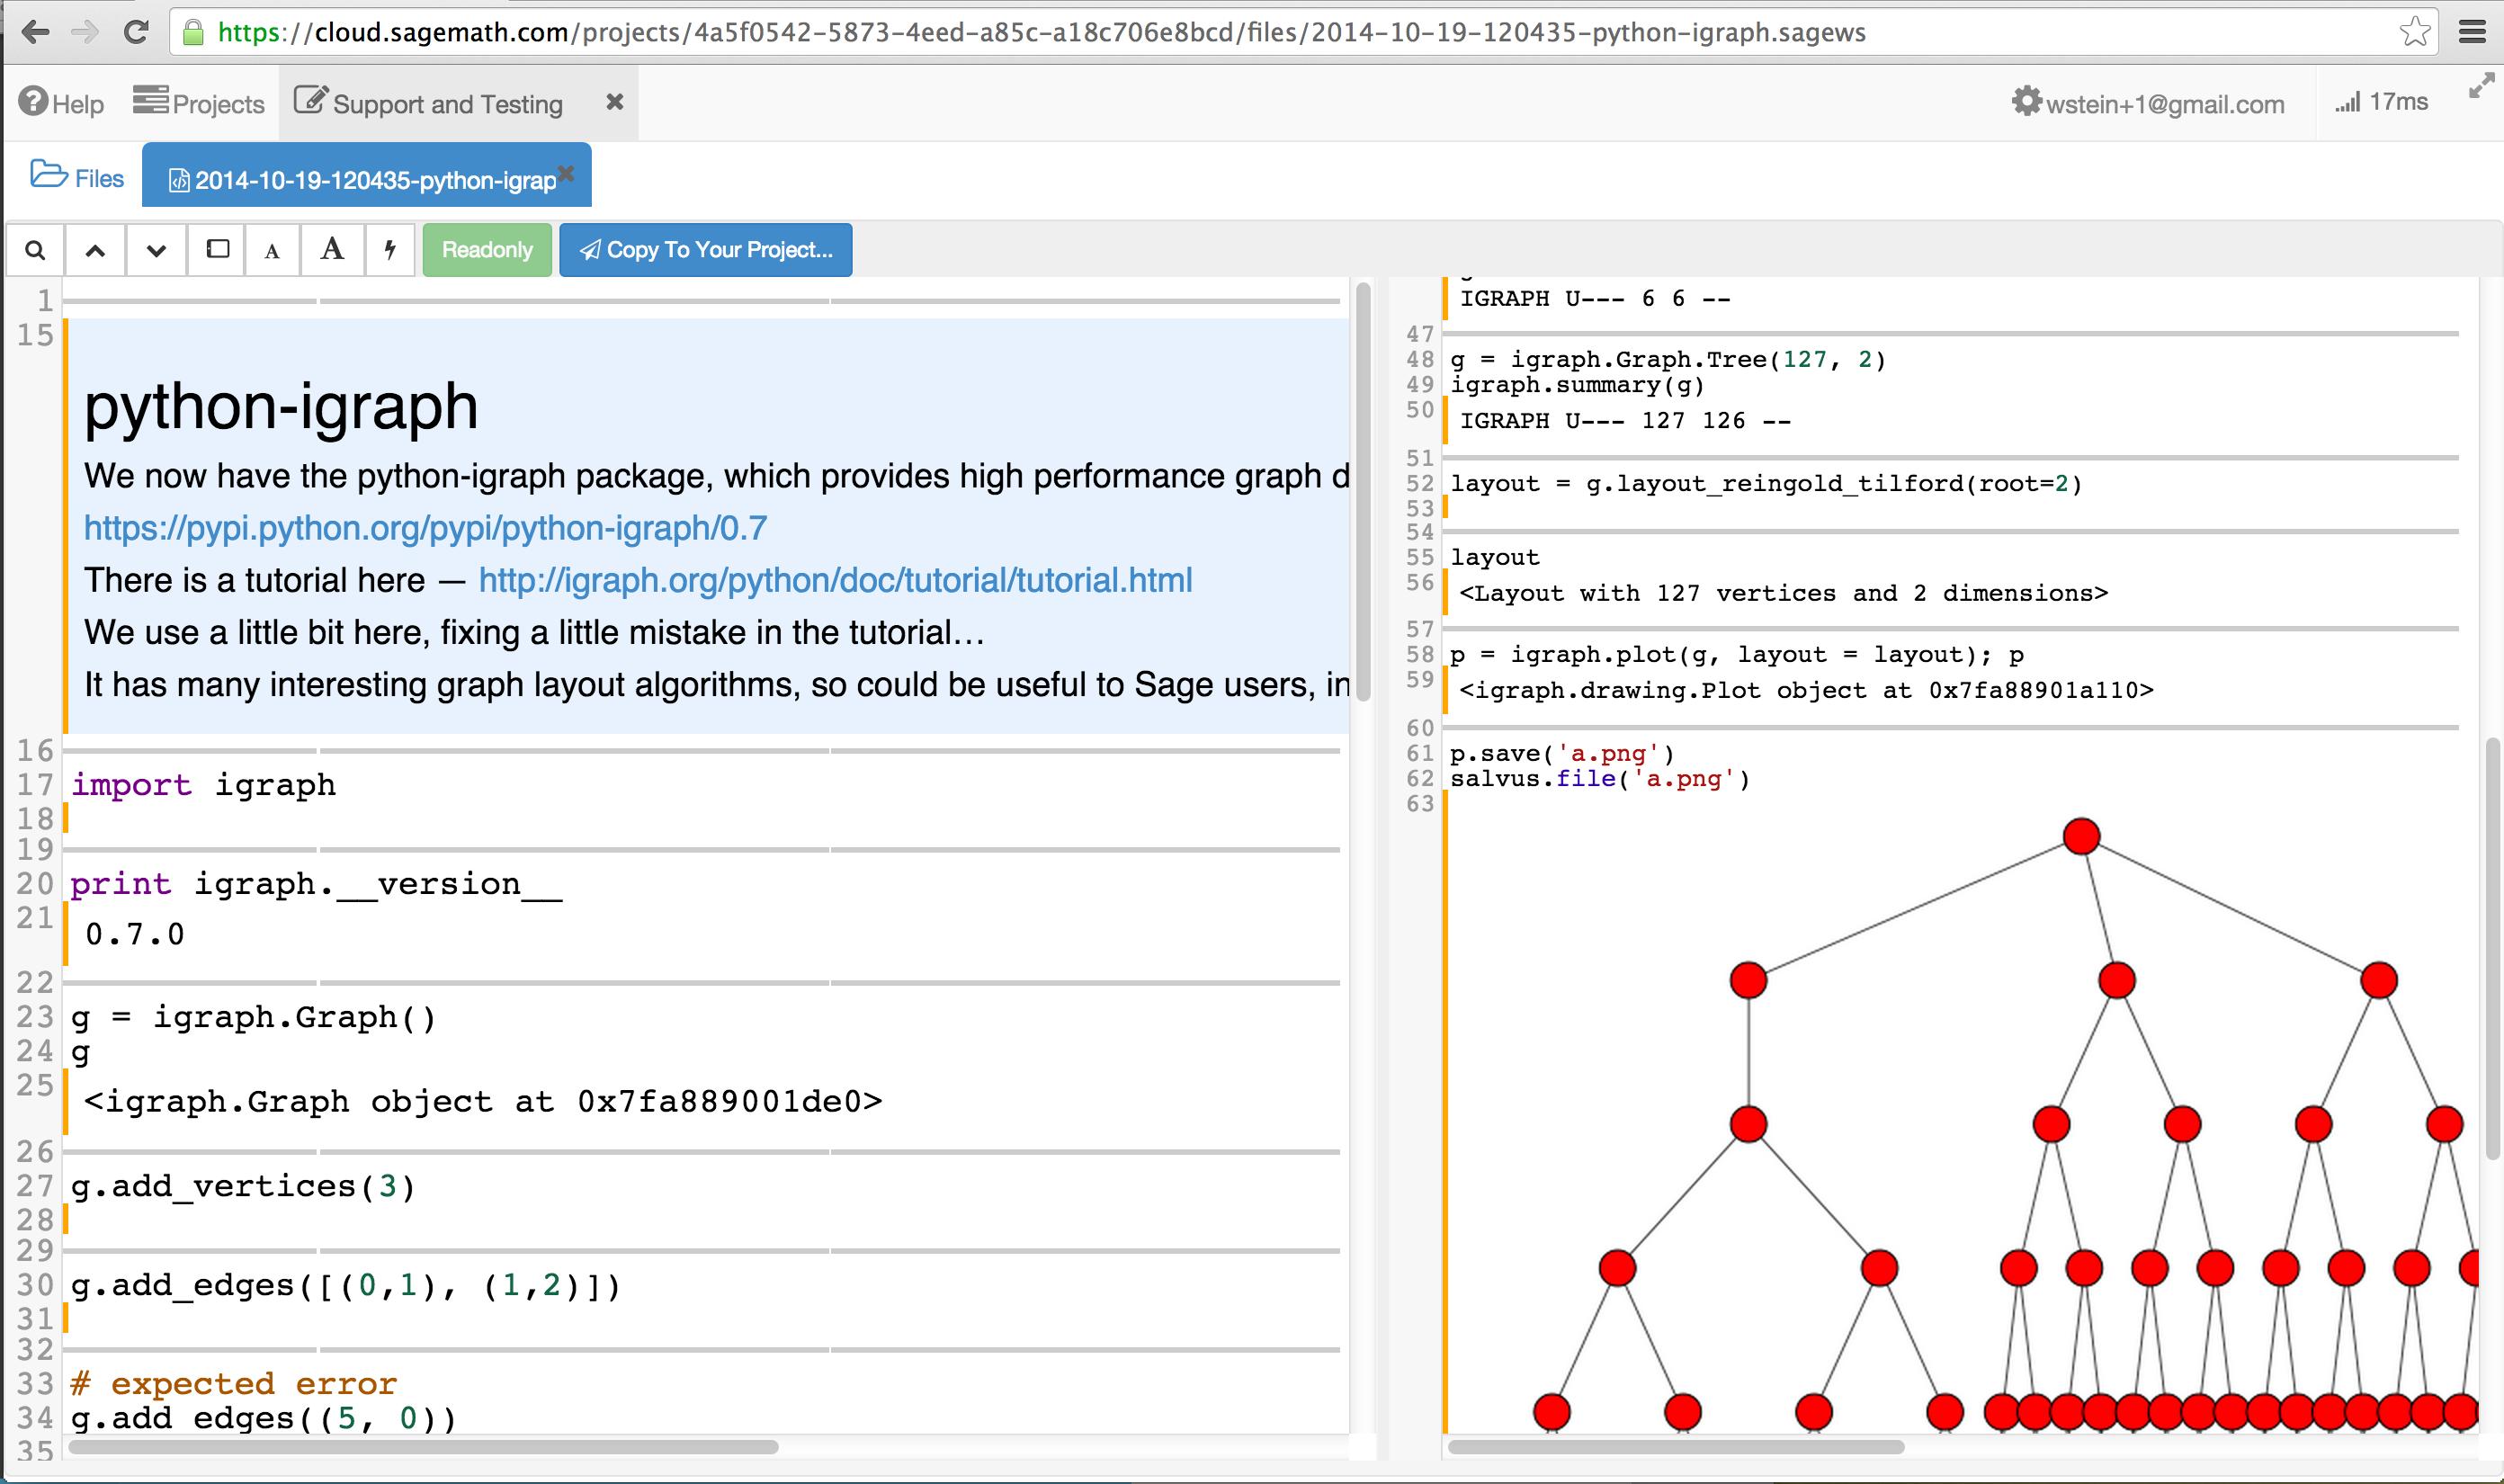 igraph] SageMathCloud + python-igraph